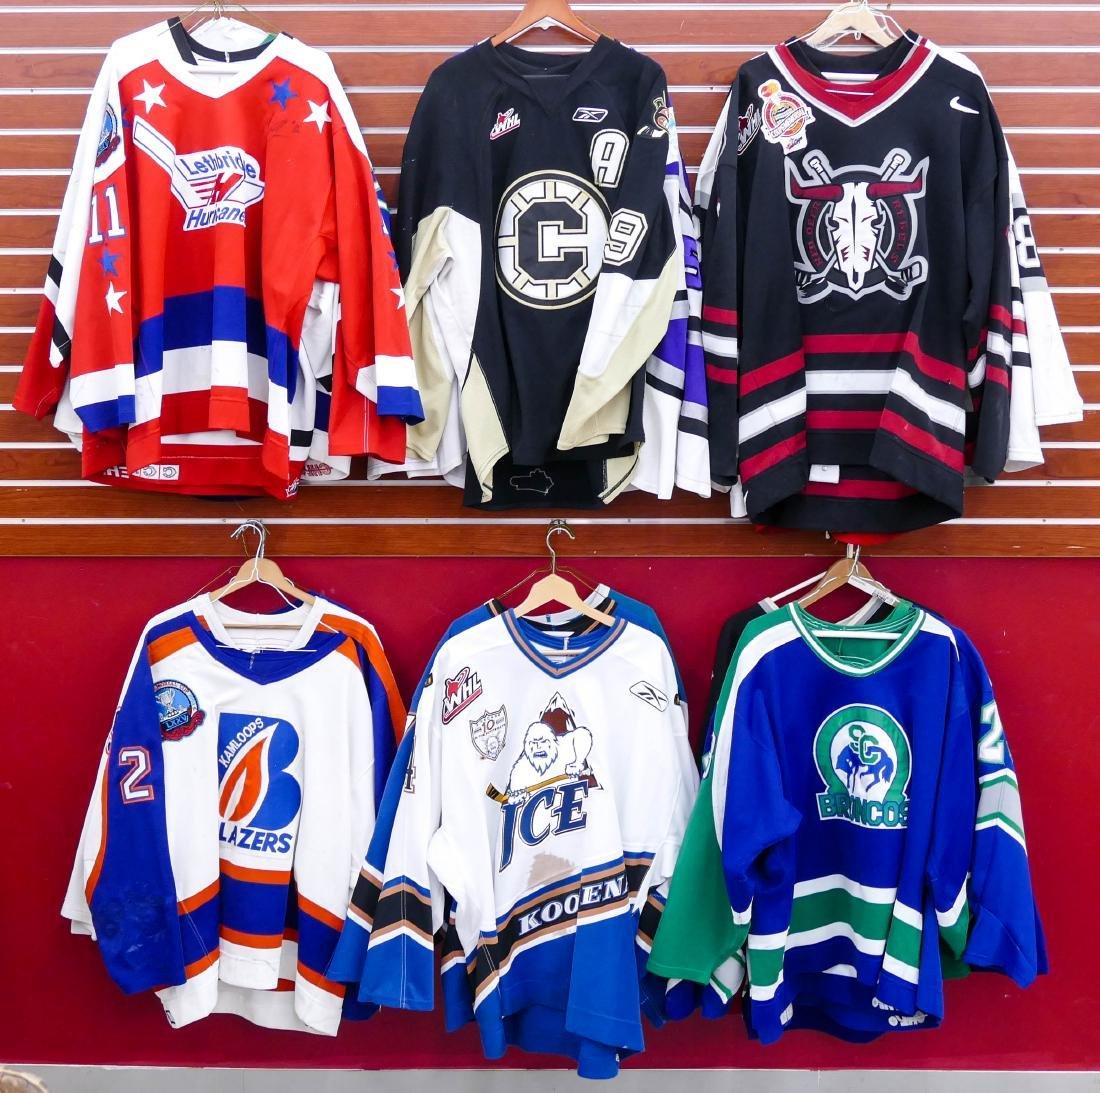 22pc WHL Western Hockey League Game Used Jerseys.